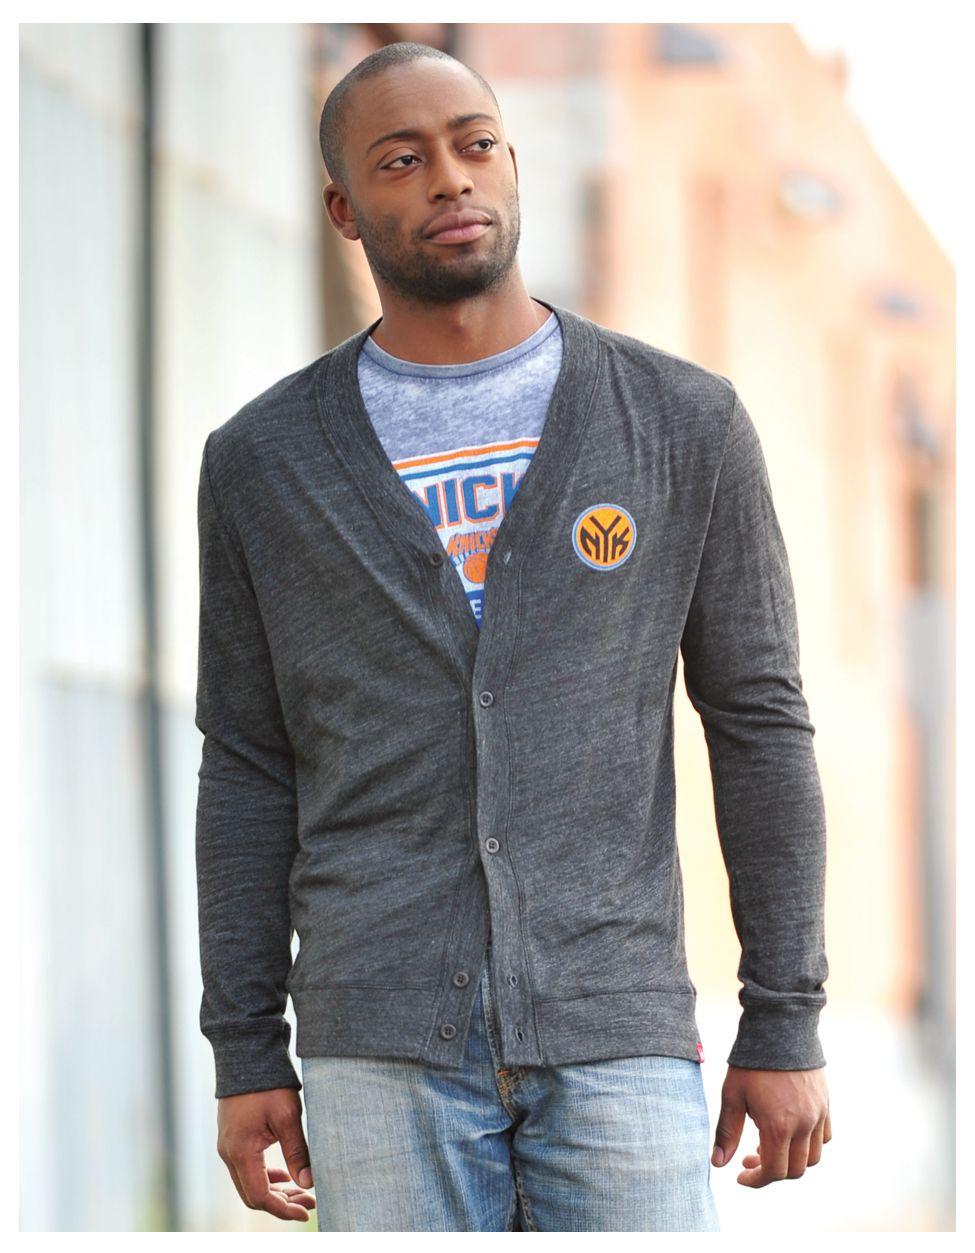 New York Knicks Apparel by Sportiqe